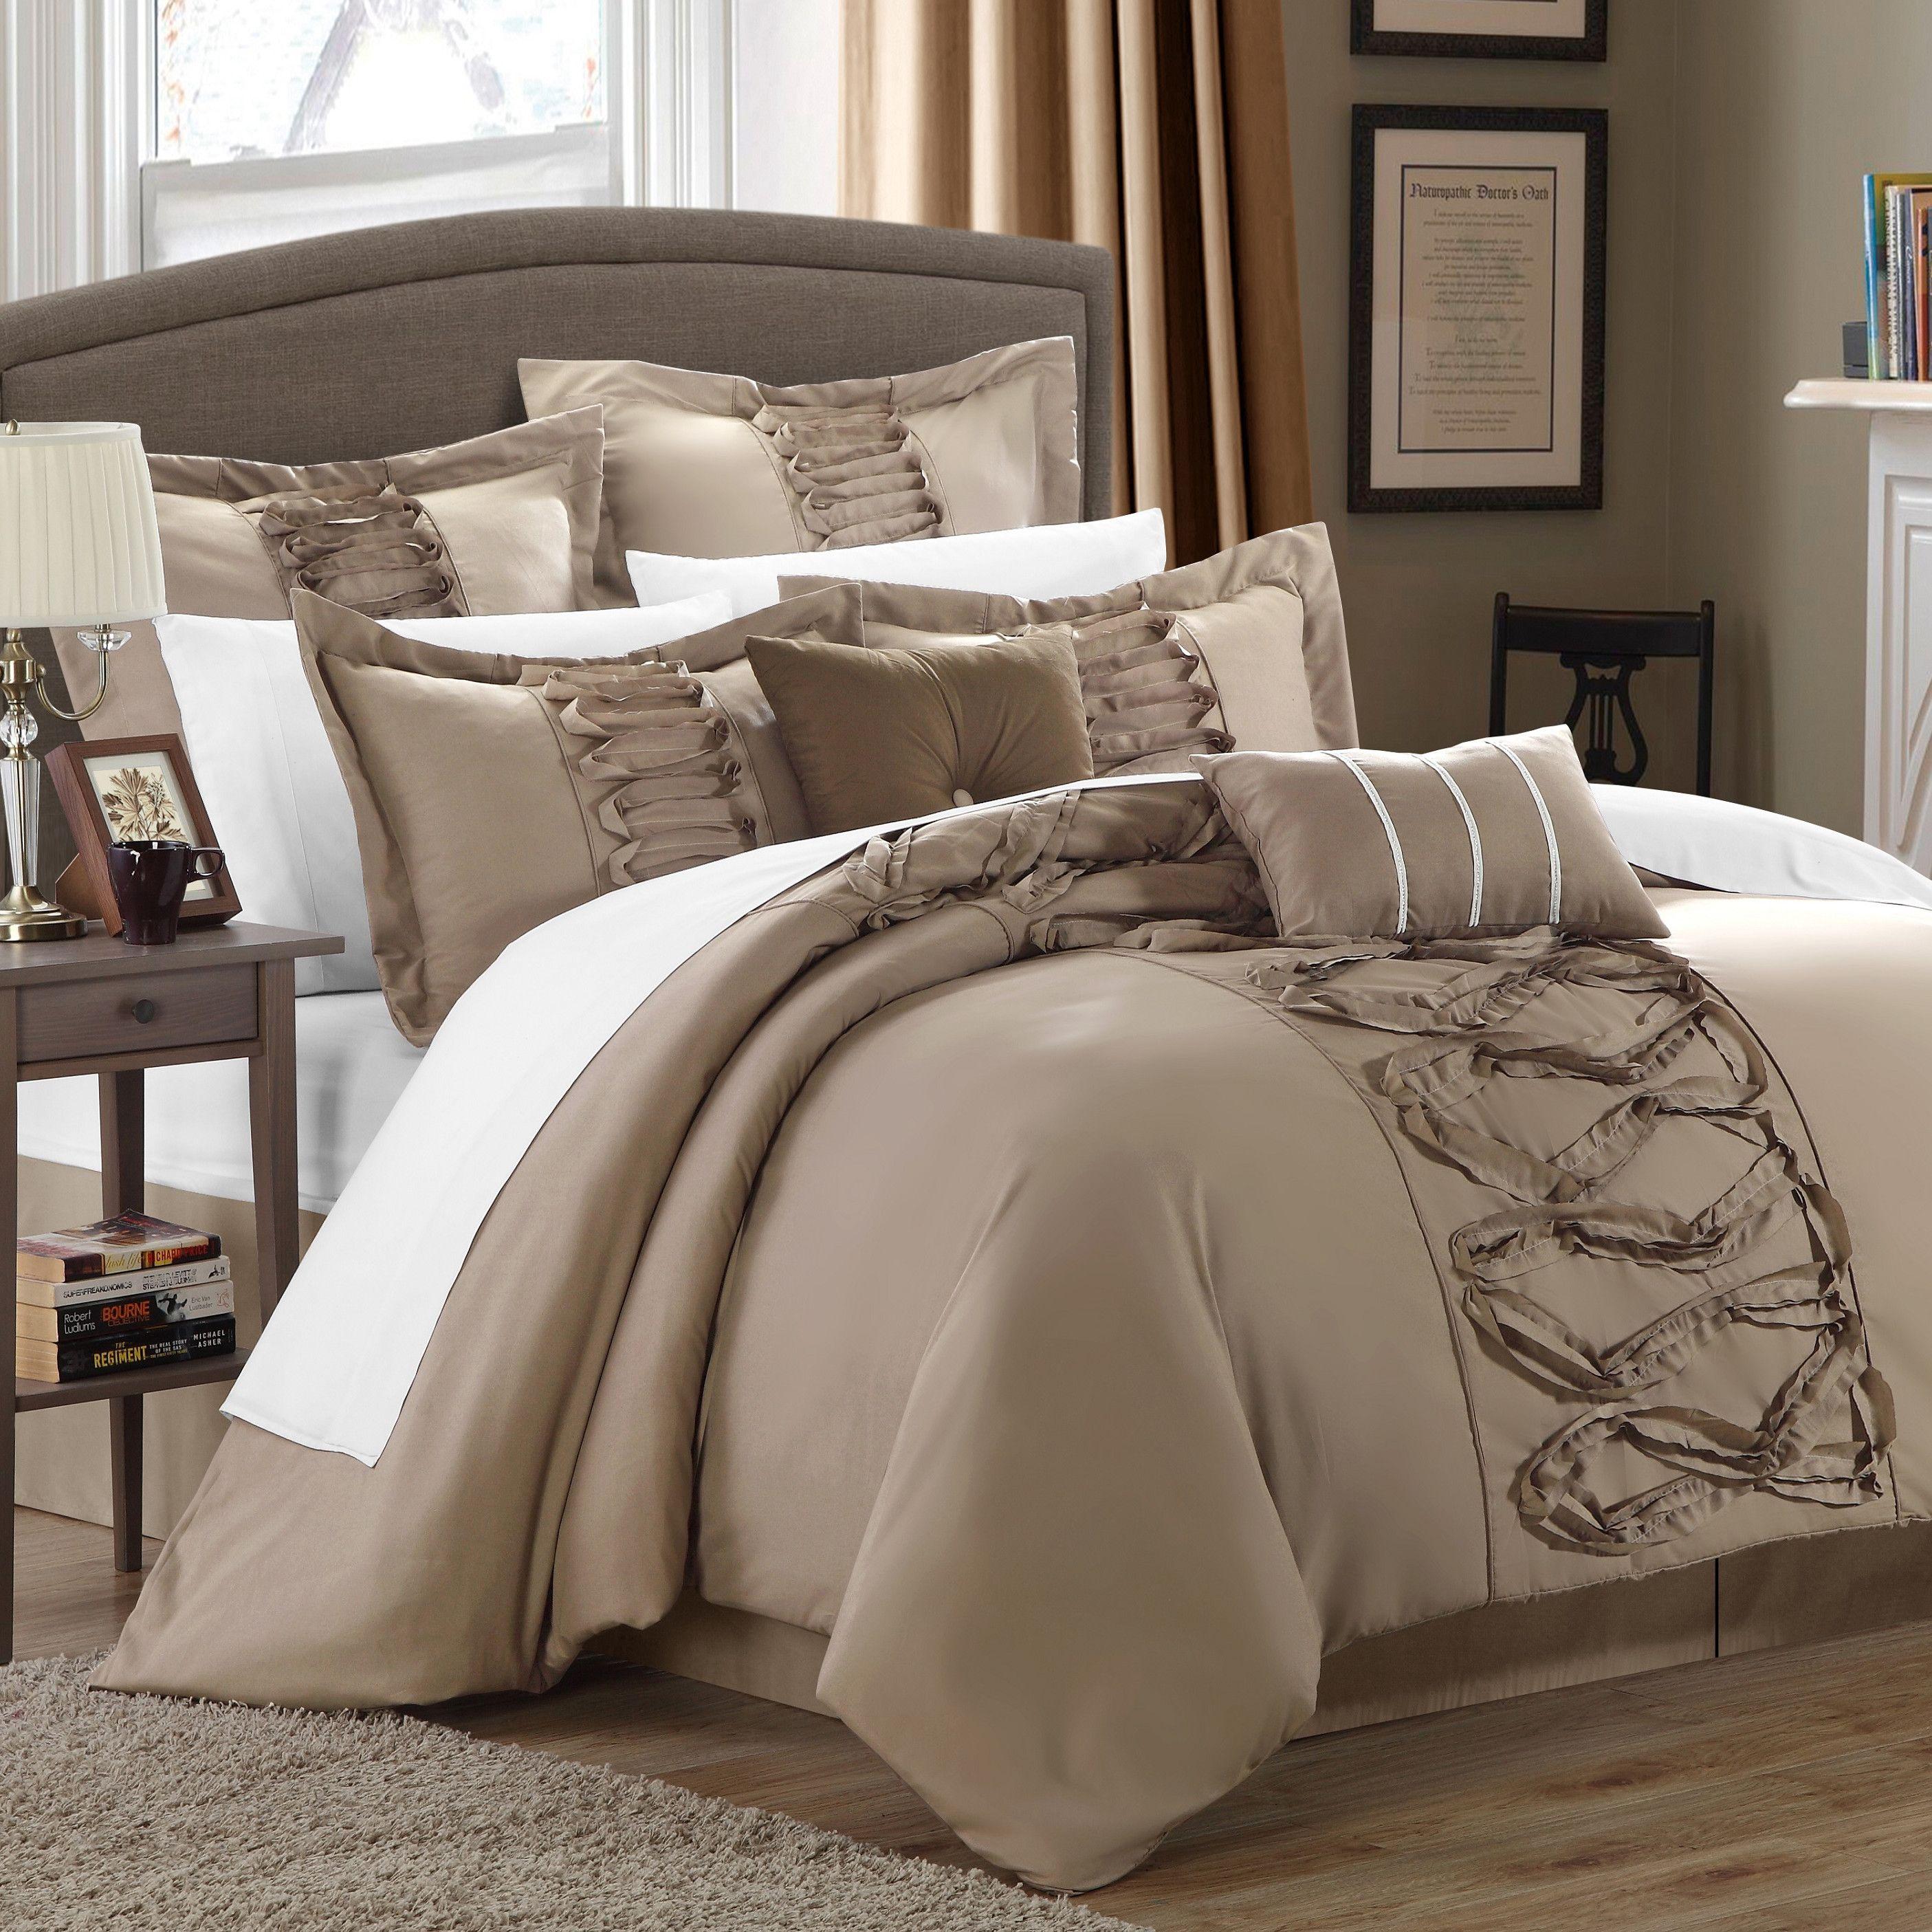 Customer Image Zoomed Comforter Sets Bed Linens Luxury Bedroom